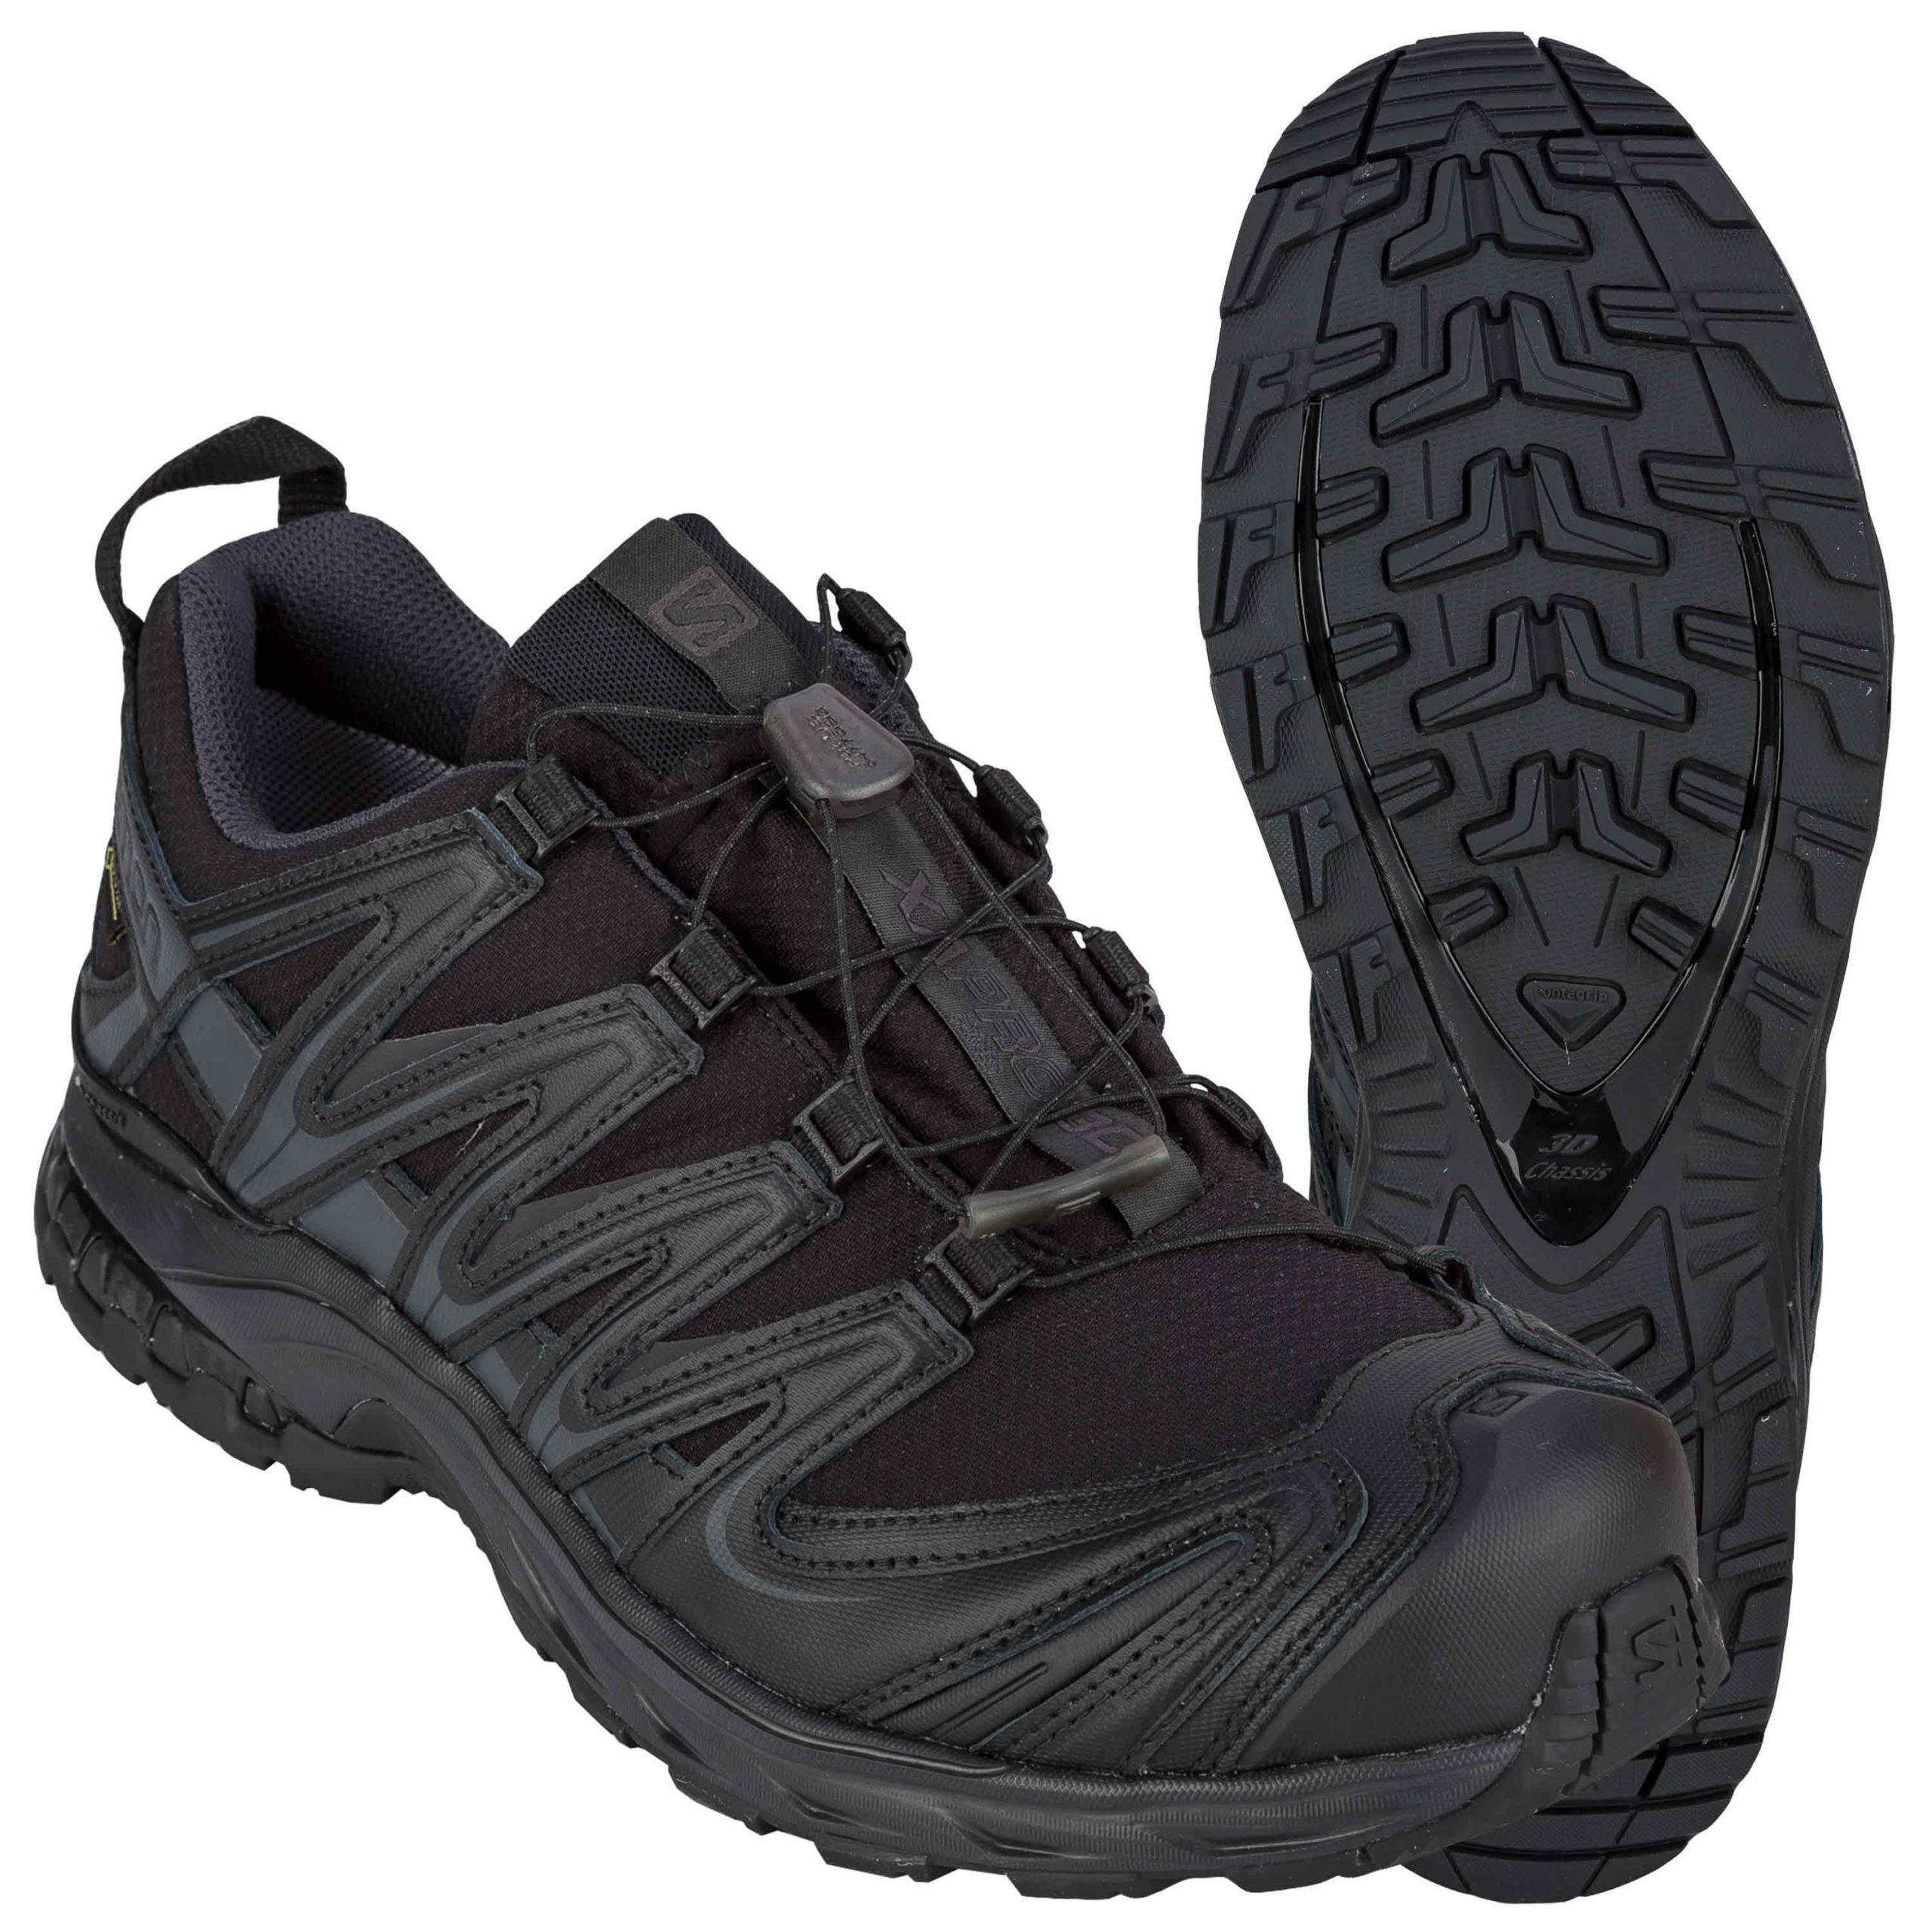 Salomon Schuhe XA Pro 3D GTX Forces schwarz